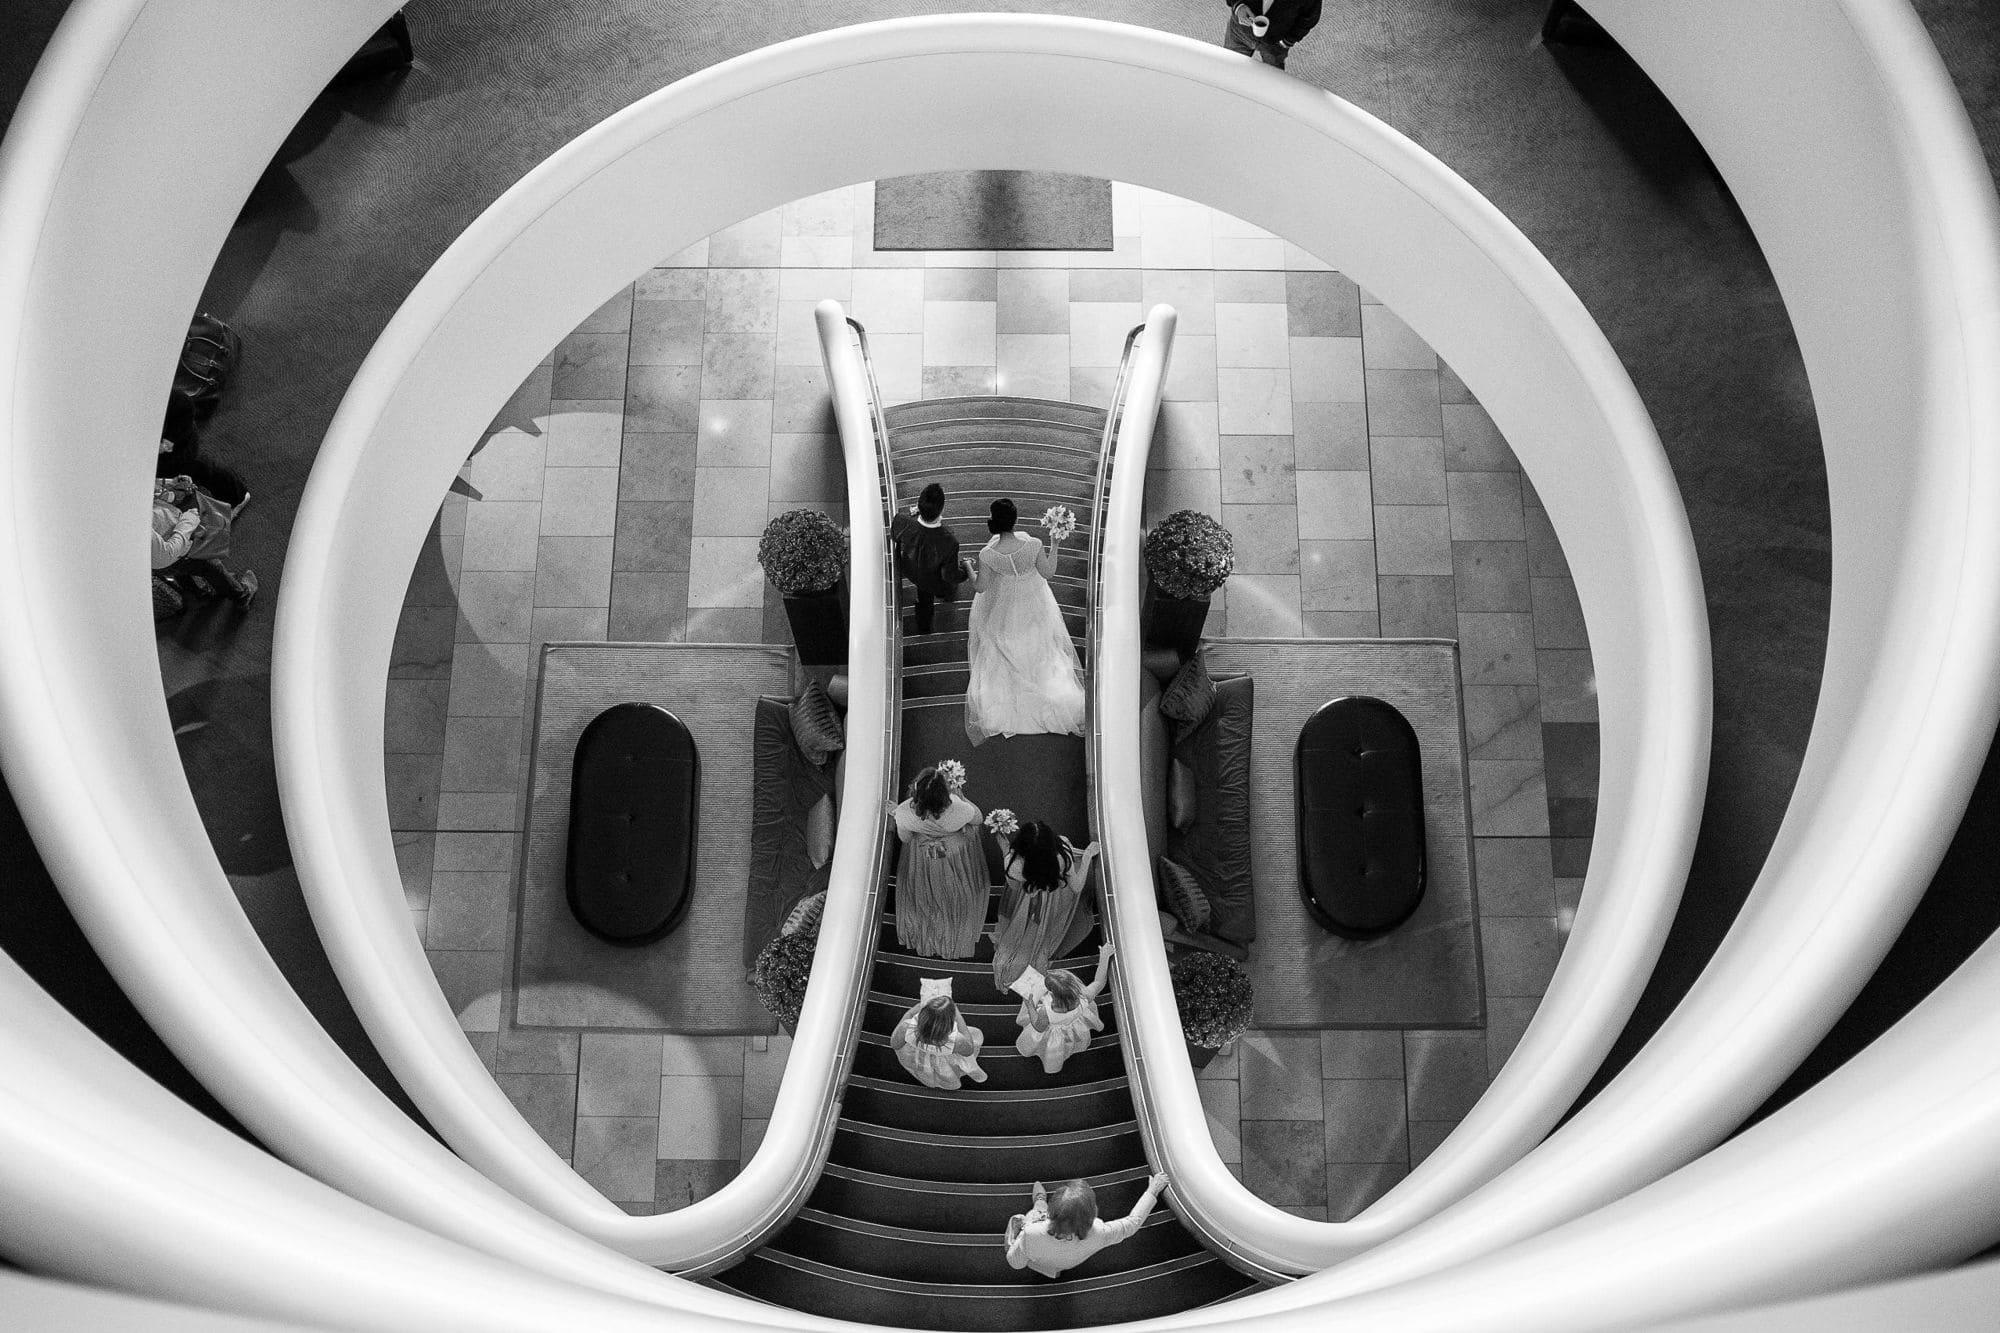 Mark-Seymour-Wedding-Photographer-UK-17 30